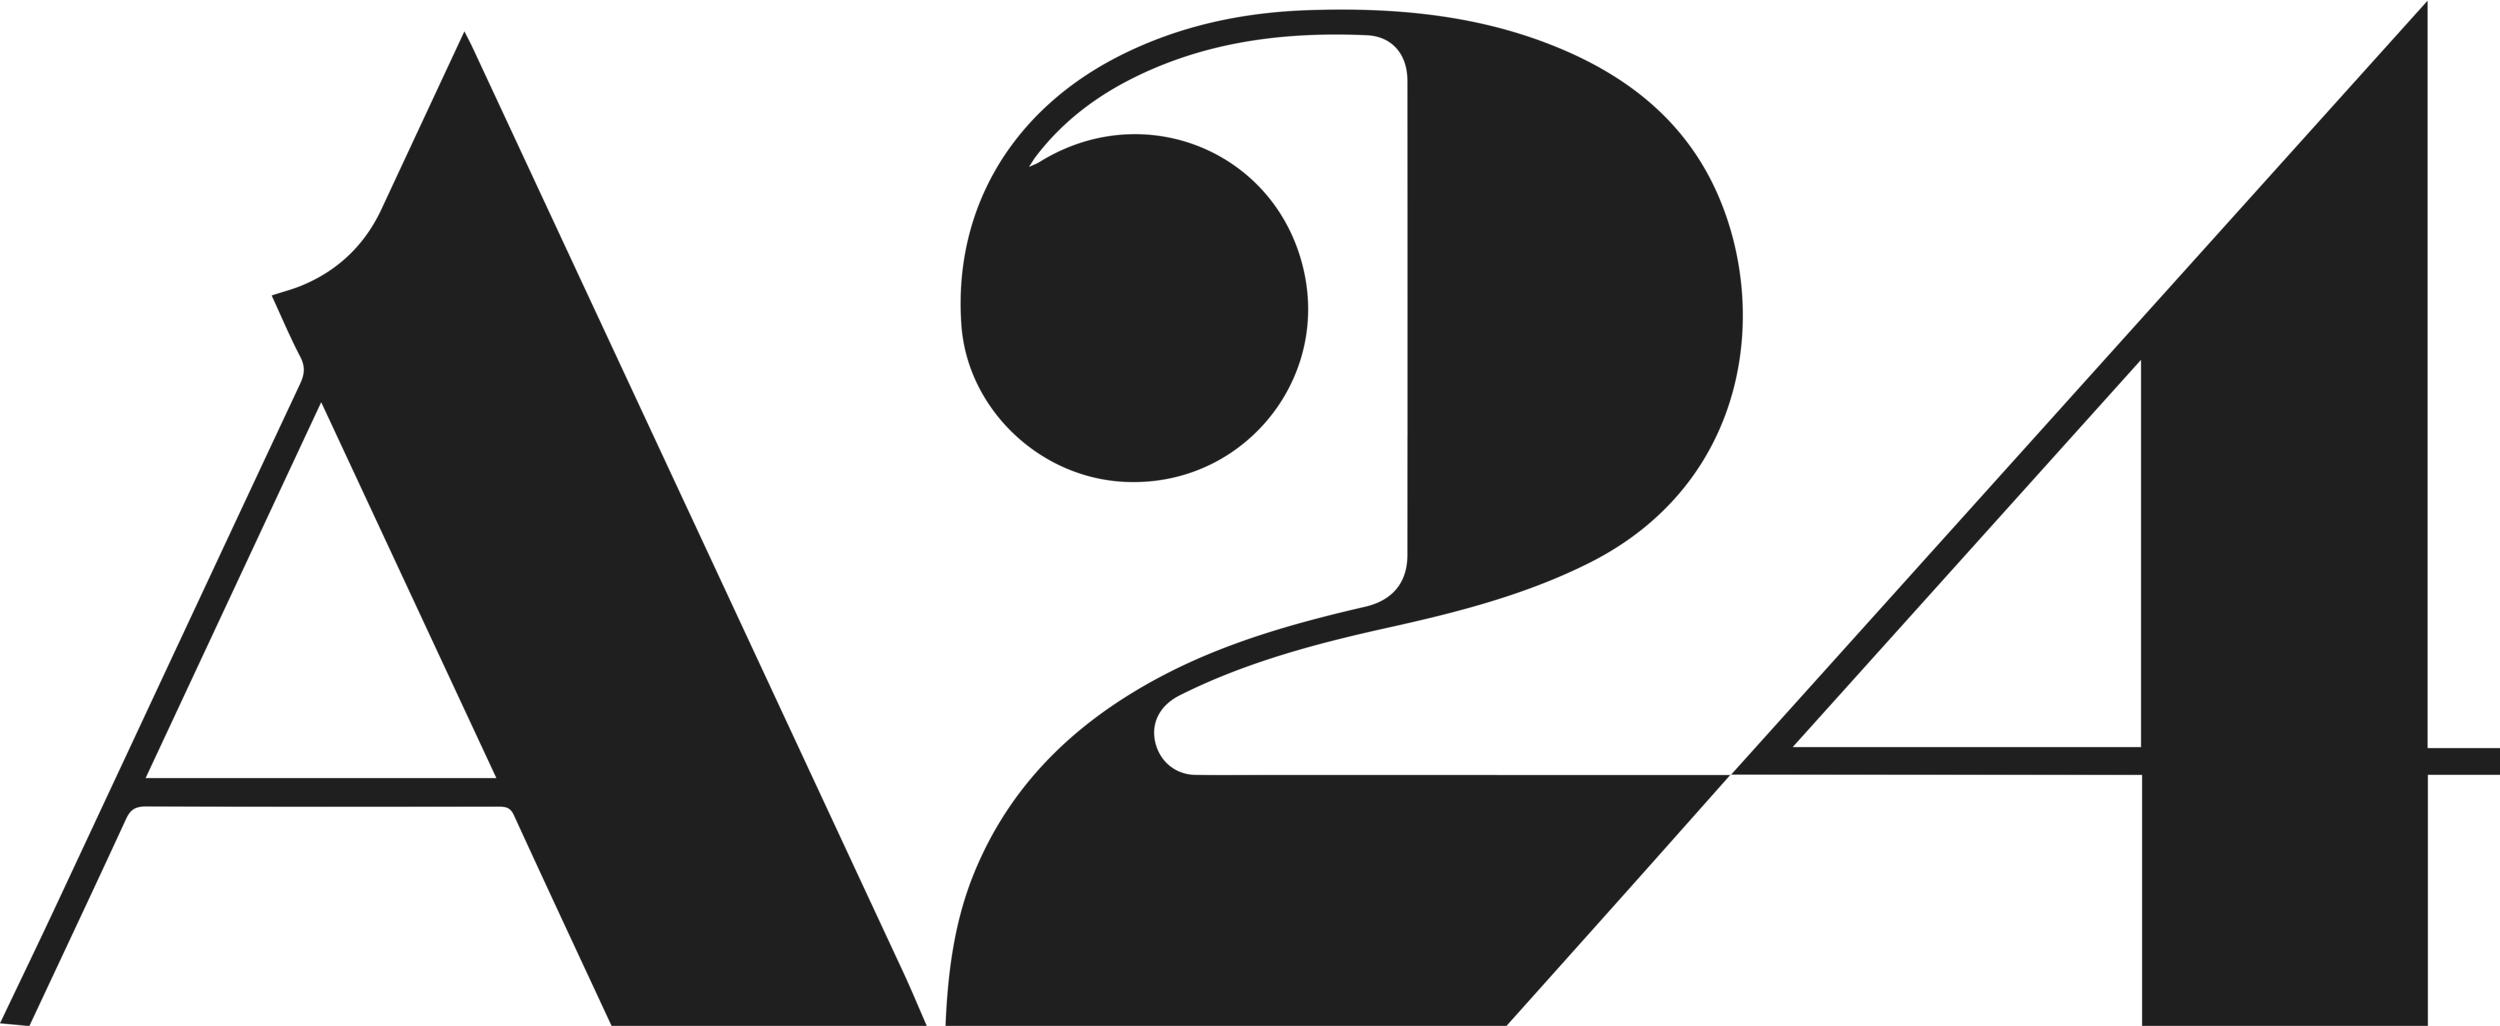 A24_logo_final.png